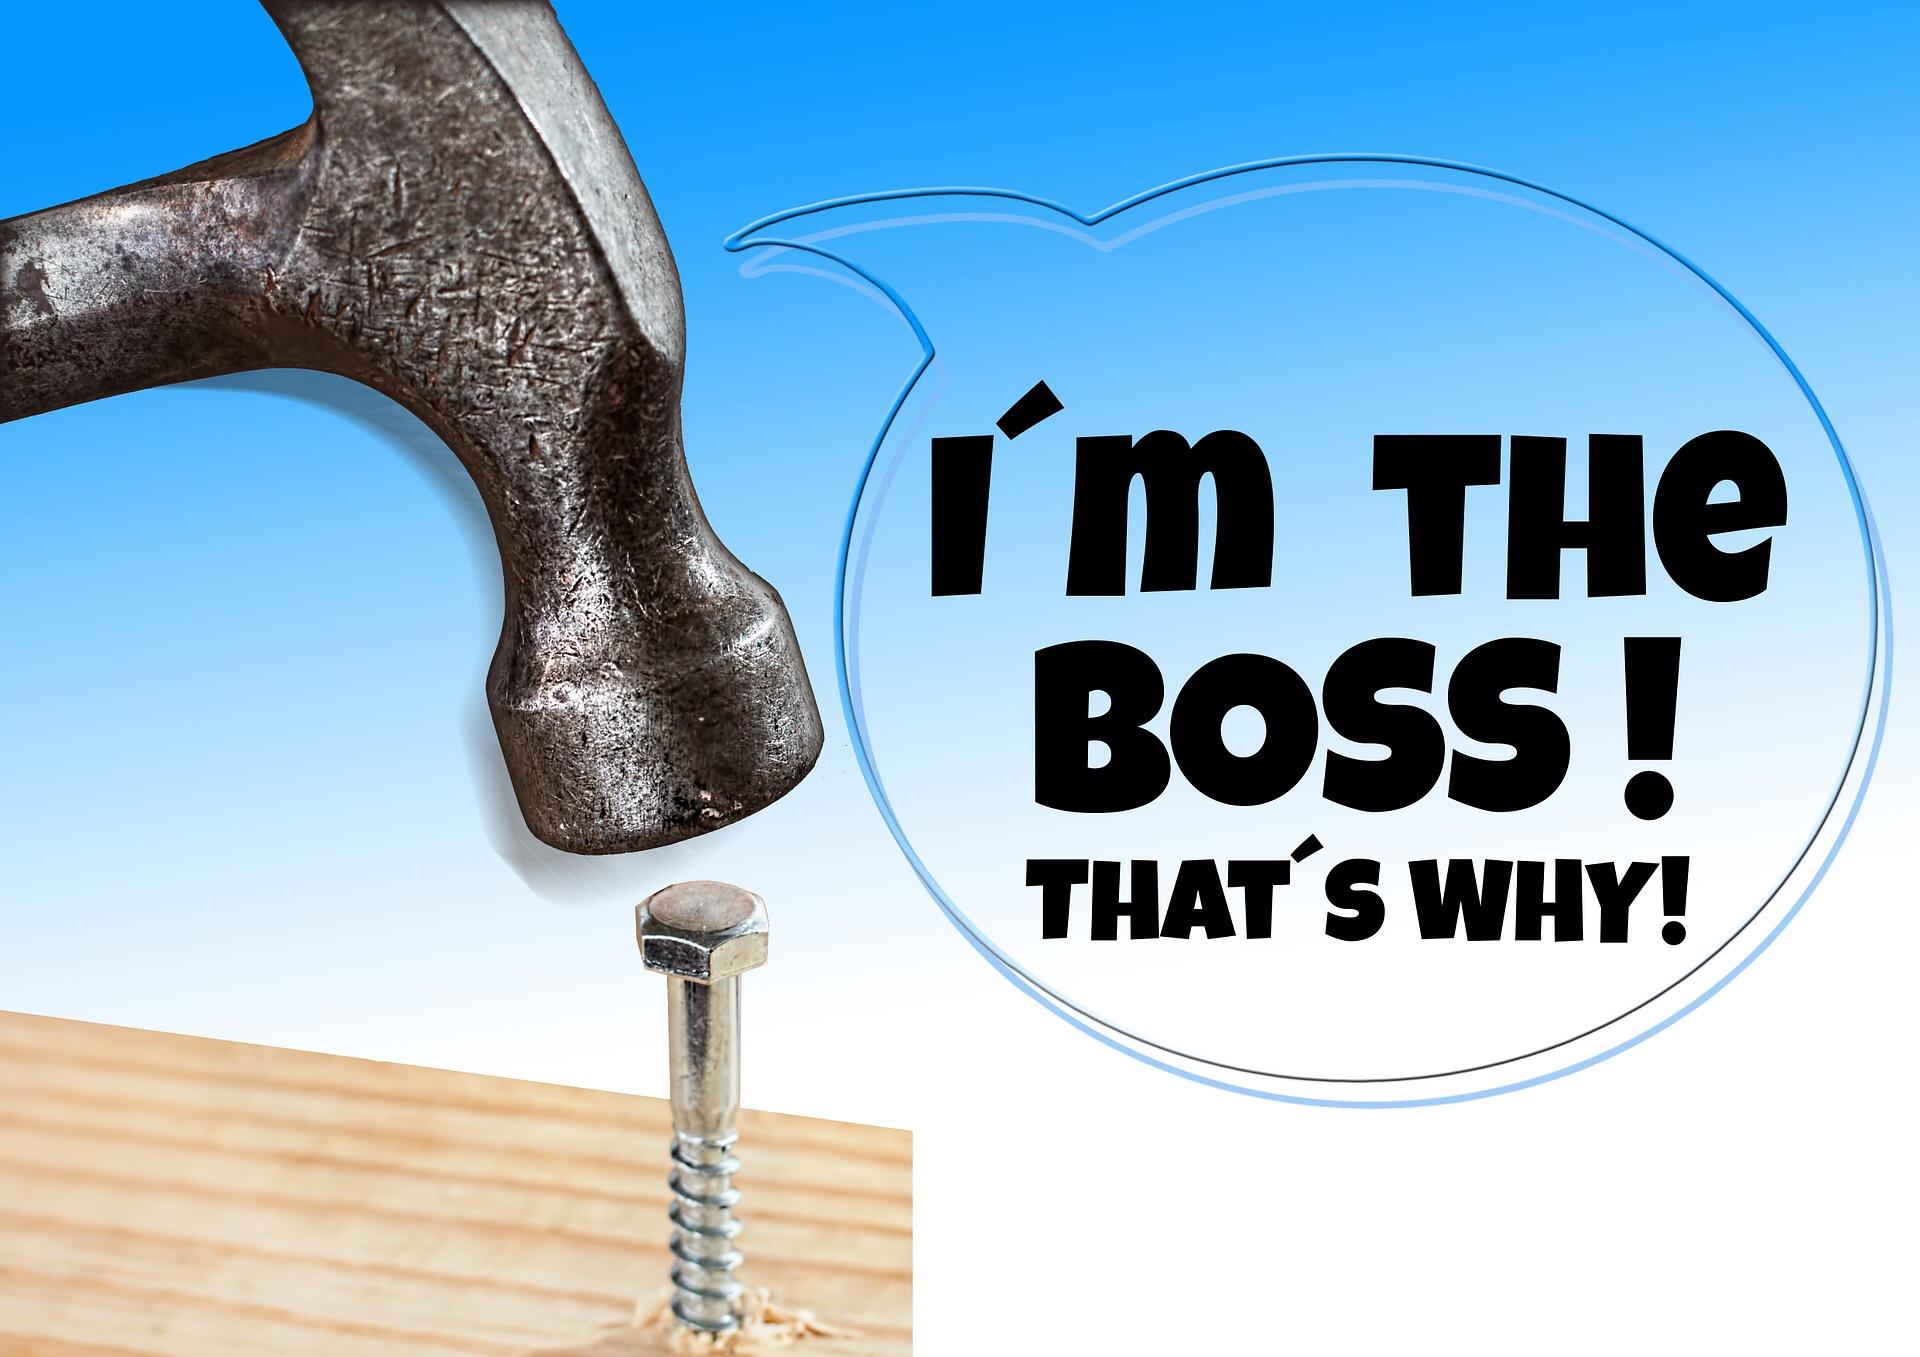 Image-14 boss.jpg